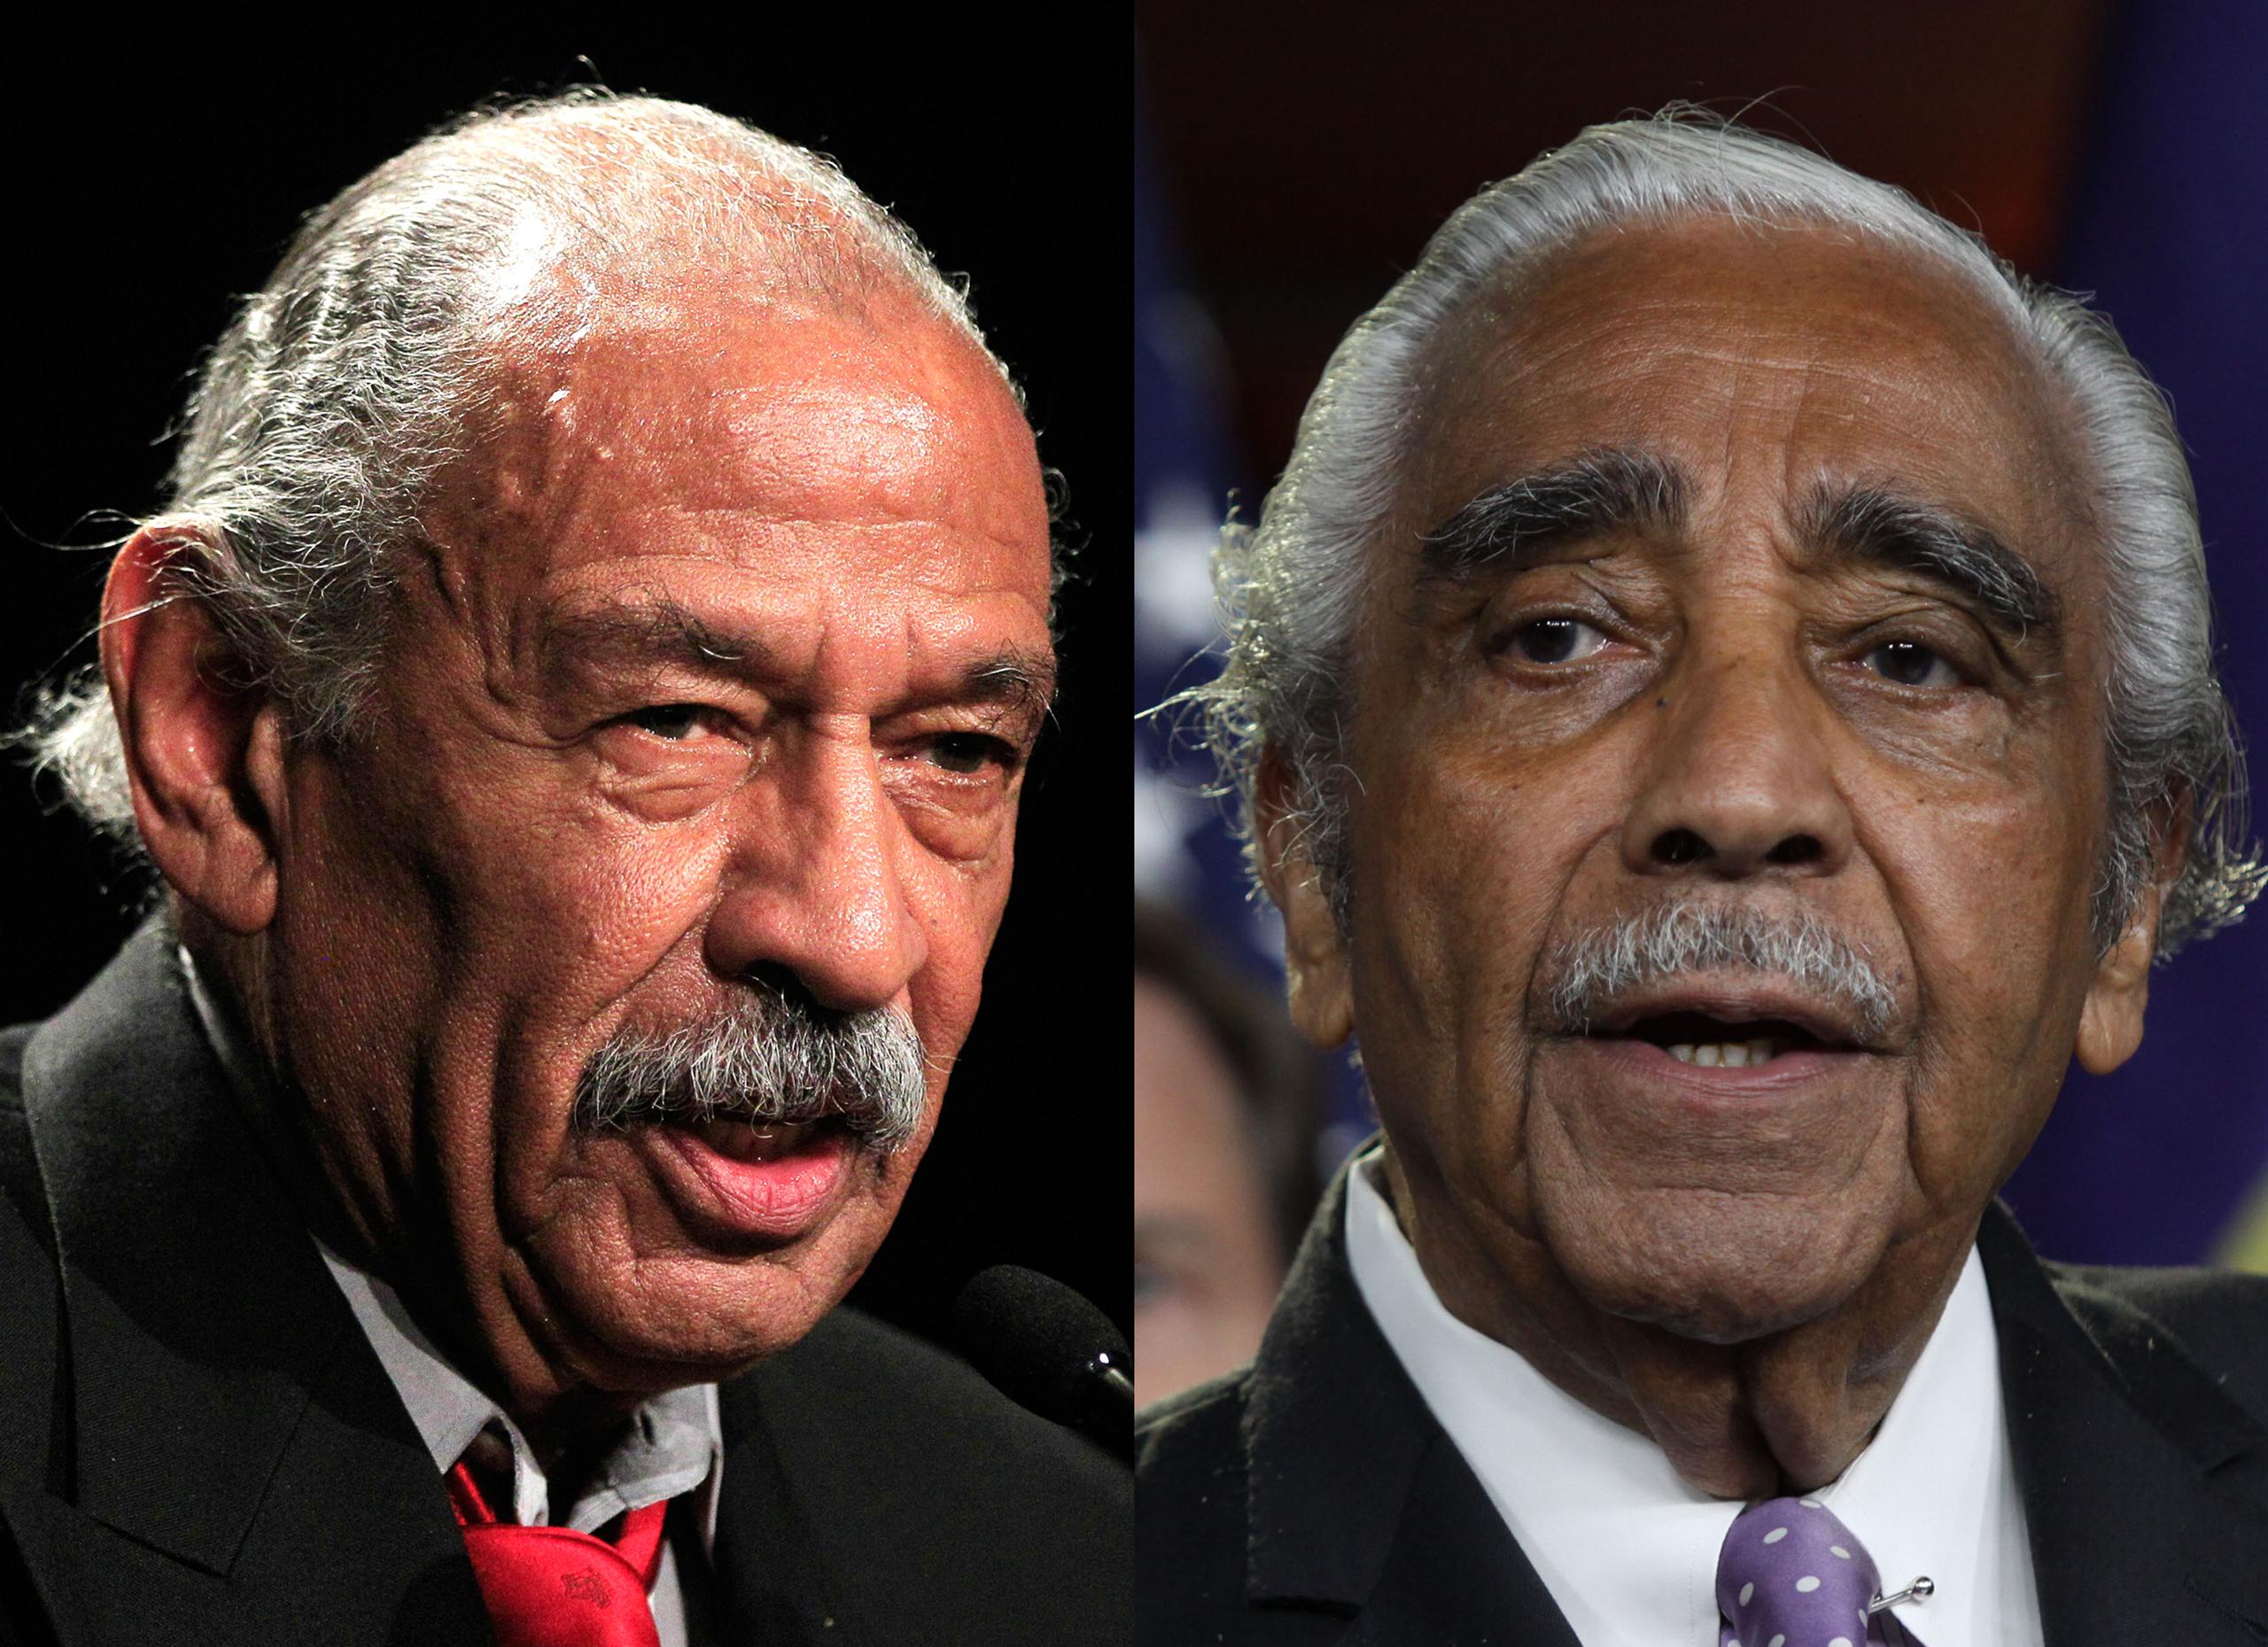 Left: Rep. John Conyers, D-Mich.; Right: Rep. Charles Rangel, D-N.Y.